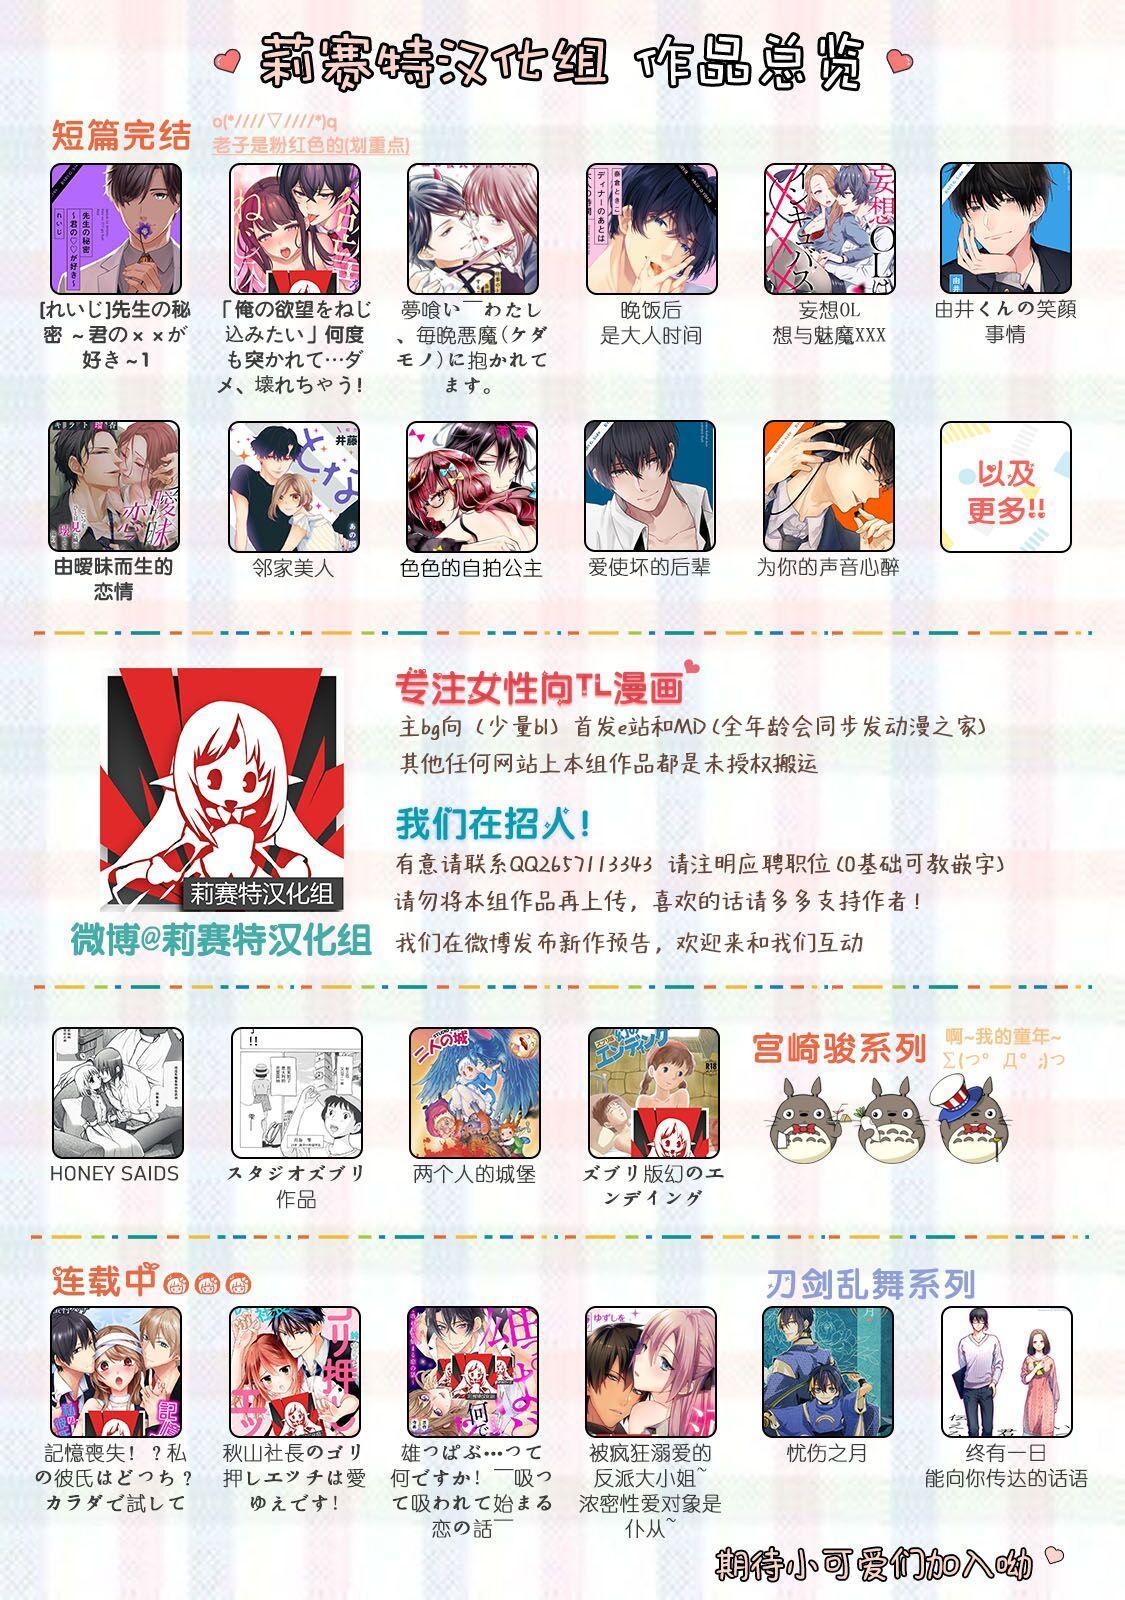 Oeyama suimutan utsukushiki oni no toraware hime | 大江山醉夢逸話 美麗的鬼與被囚禁的公主 Ch. 1-8 206